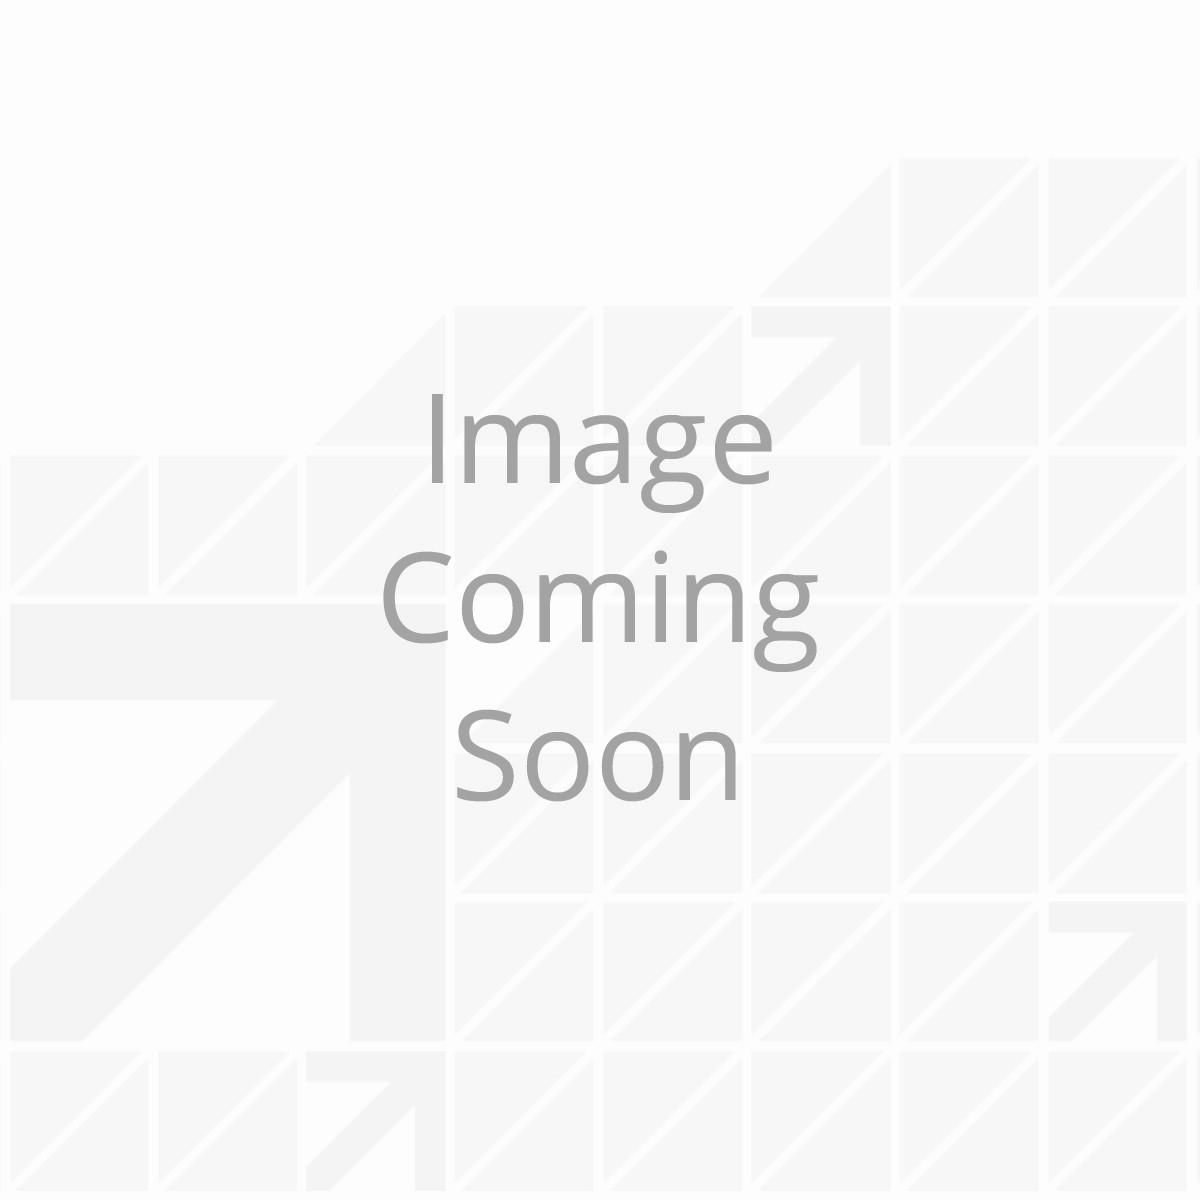 Home Page Store Lci1 Com